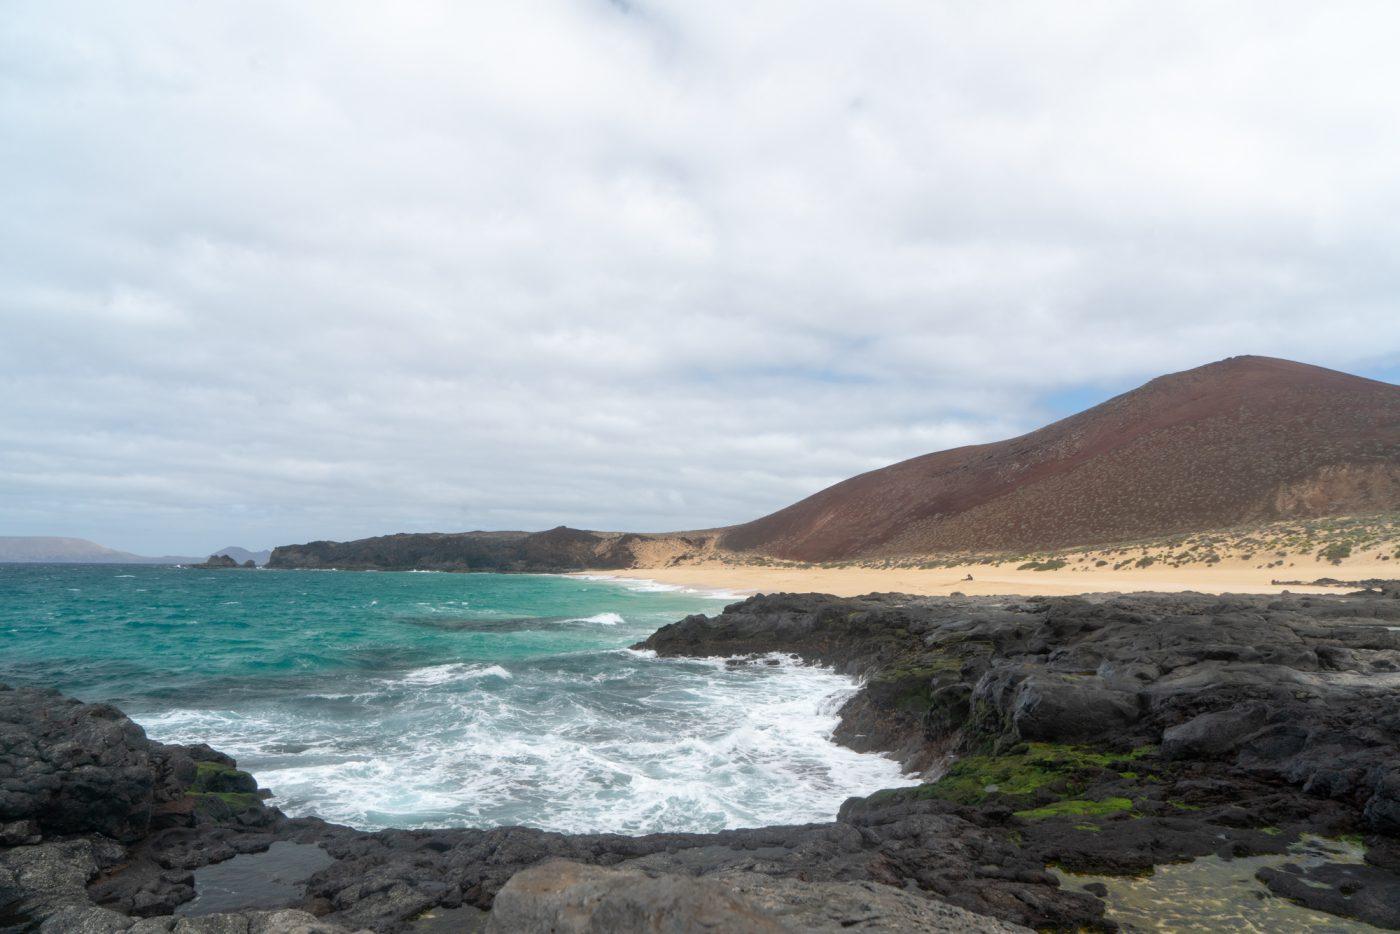 Take the ferry to visit Playa de las Conchas on La Graciosa